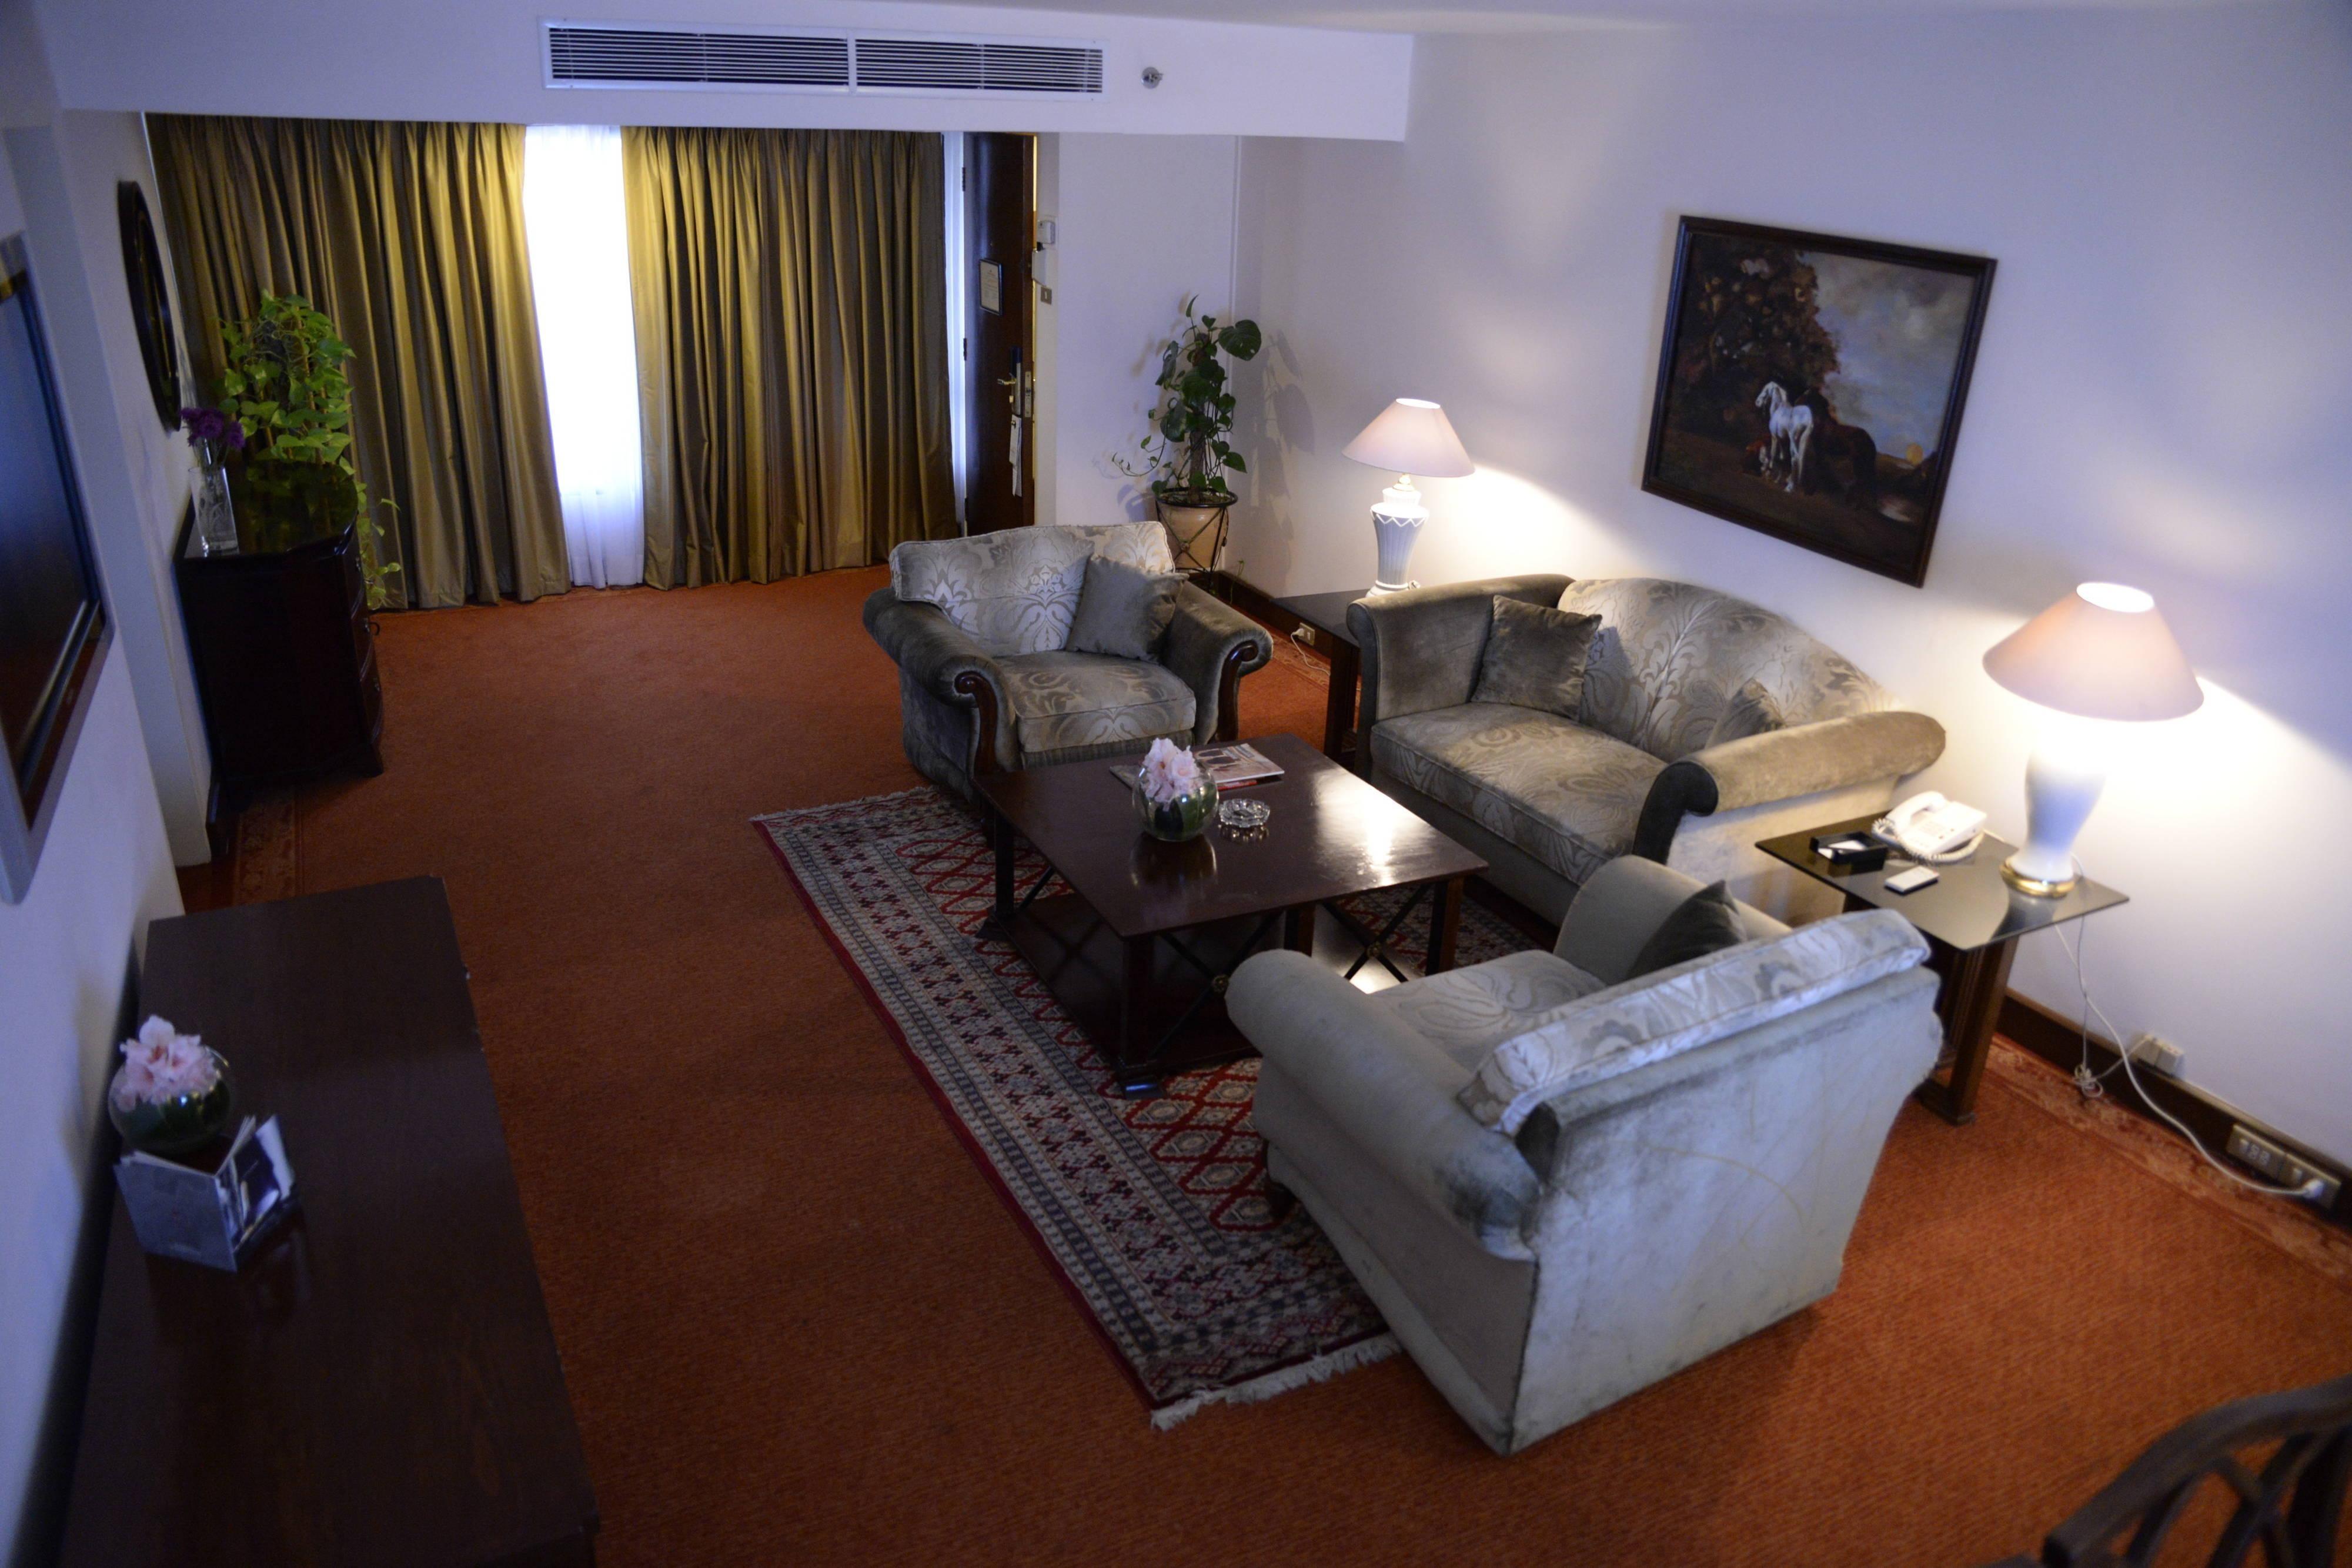 Free chat hookup rooms karachi airport video